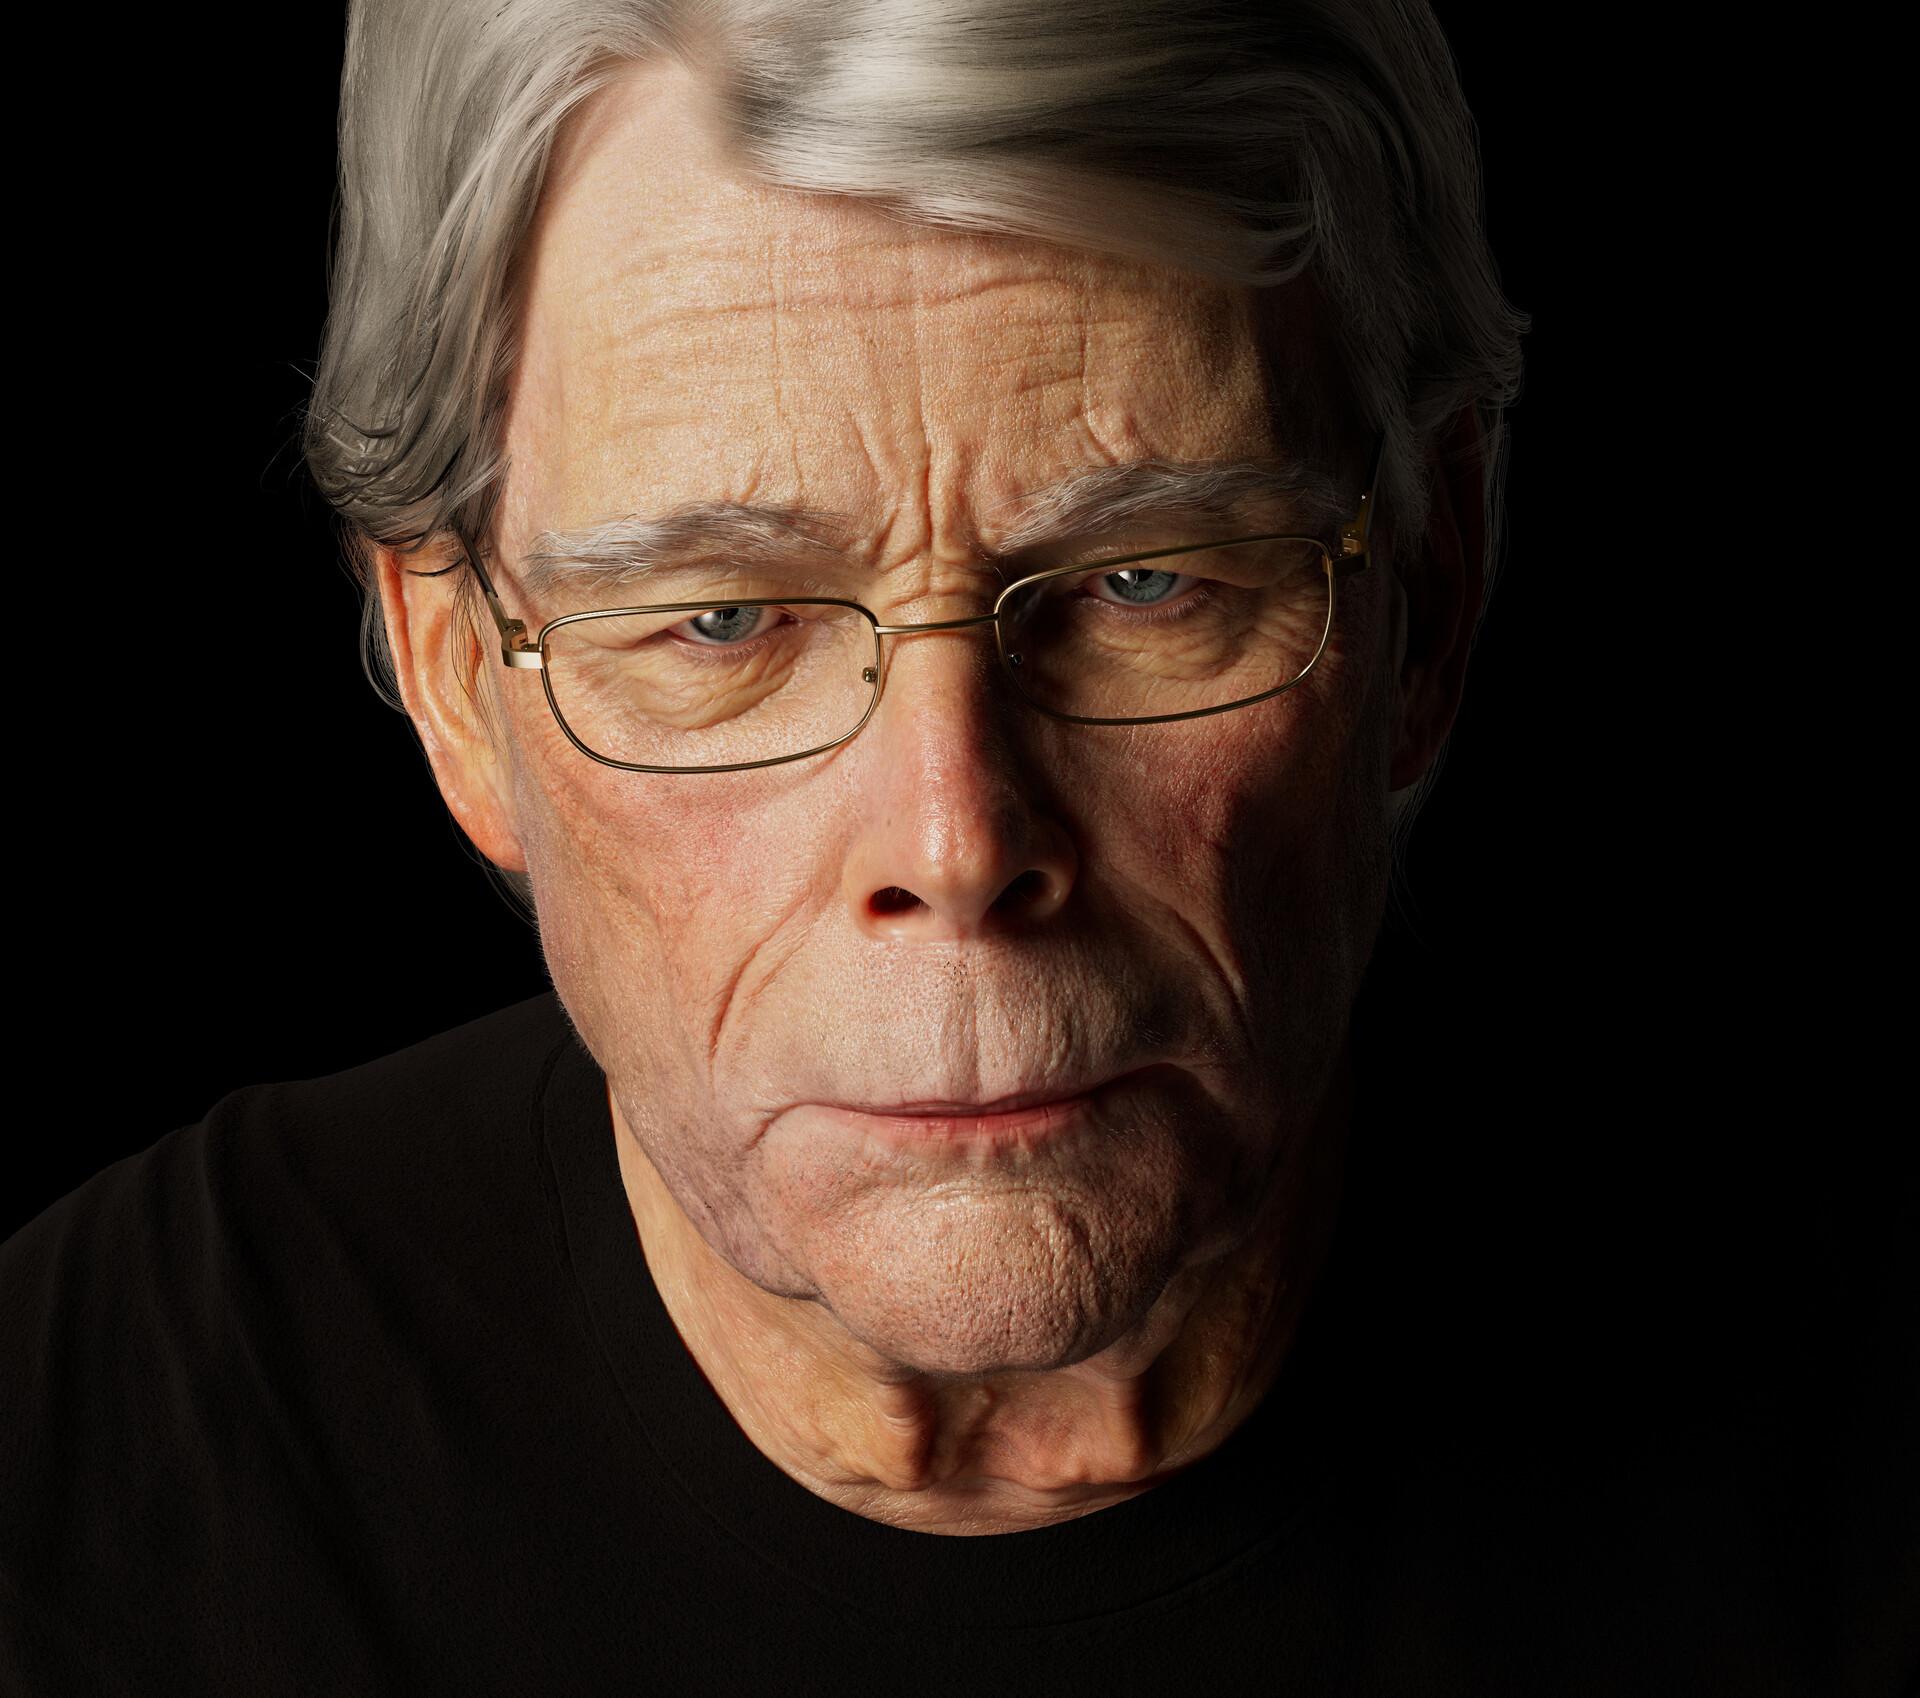 Portrait of Stephen King